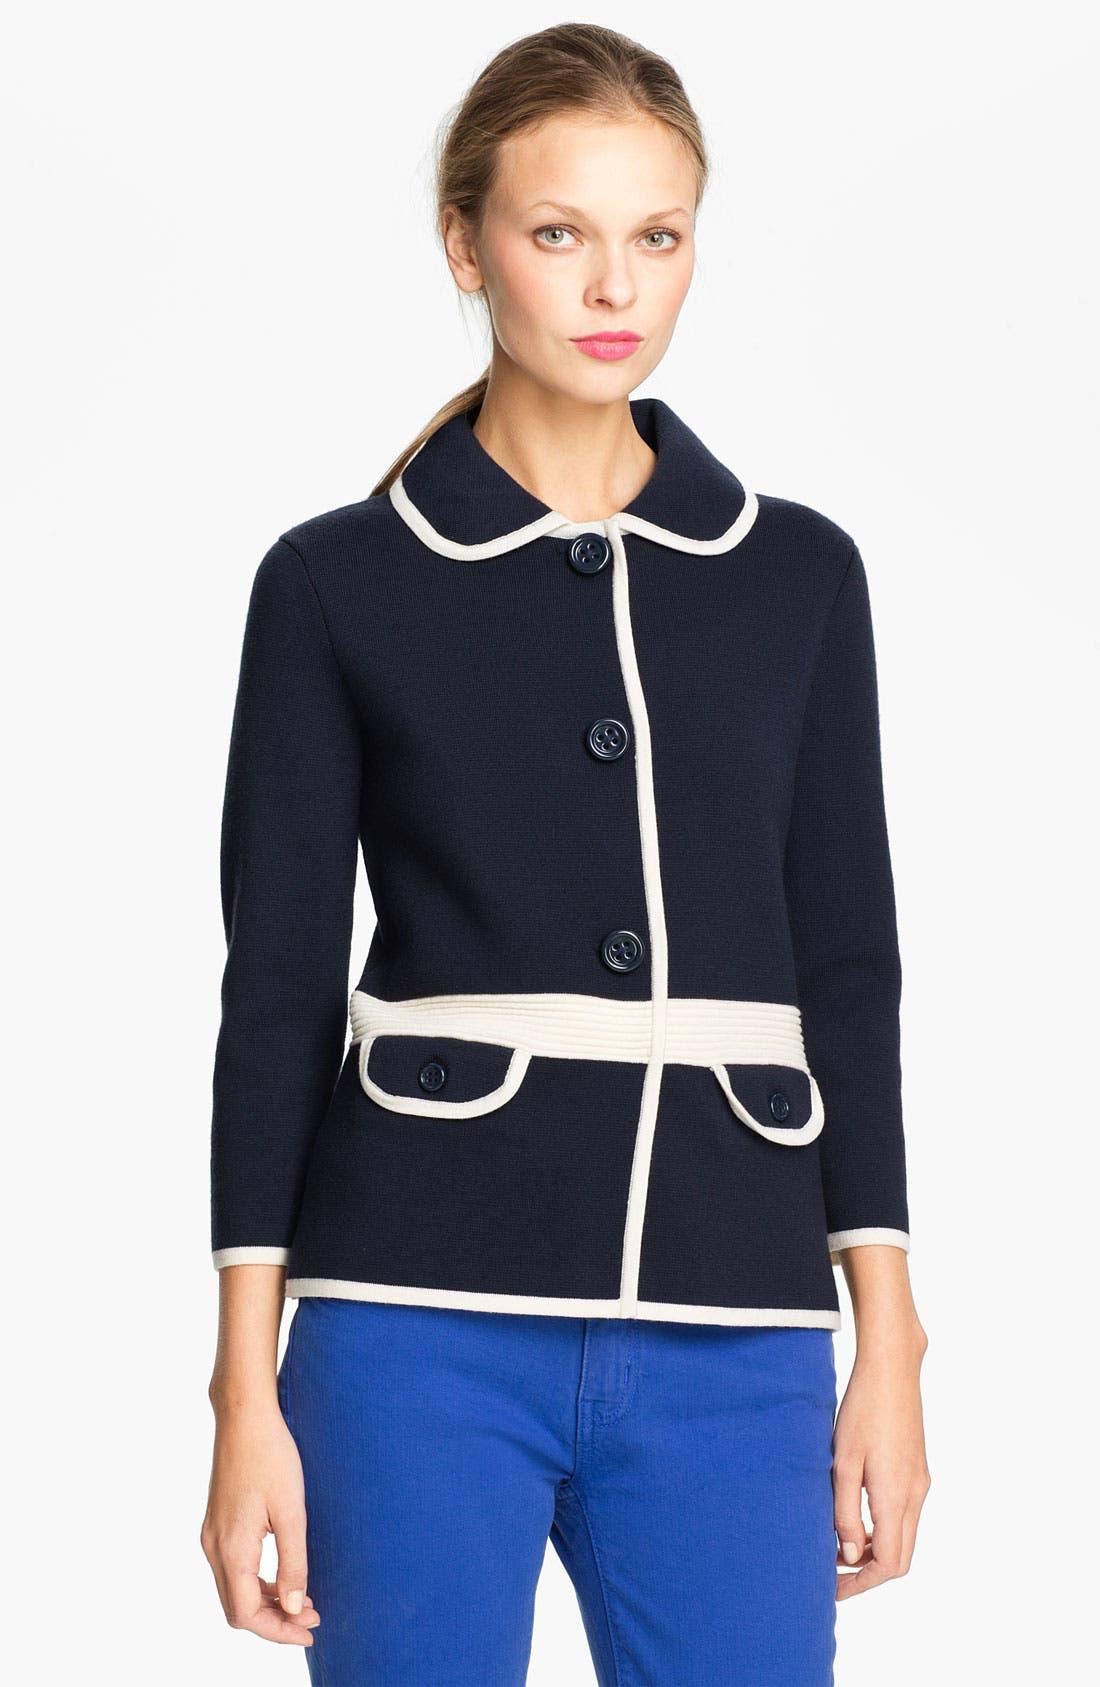 Main Image - kate spade new york 'mayson' sweater jacket